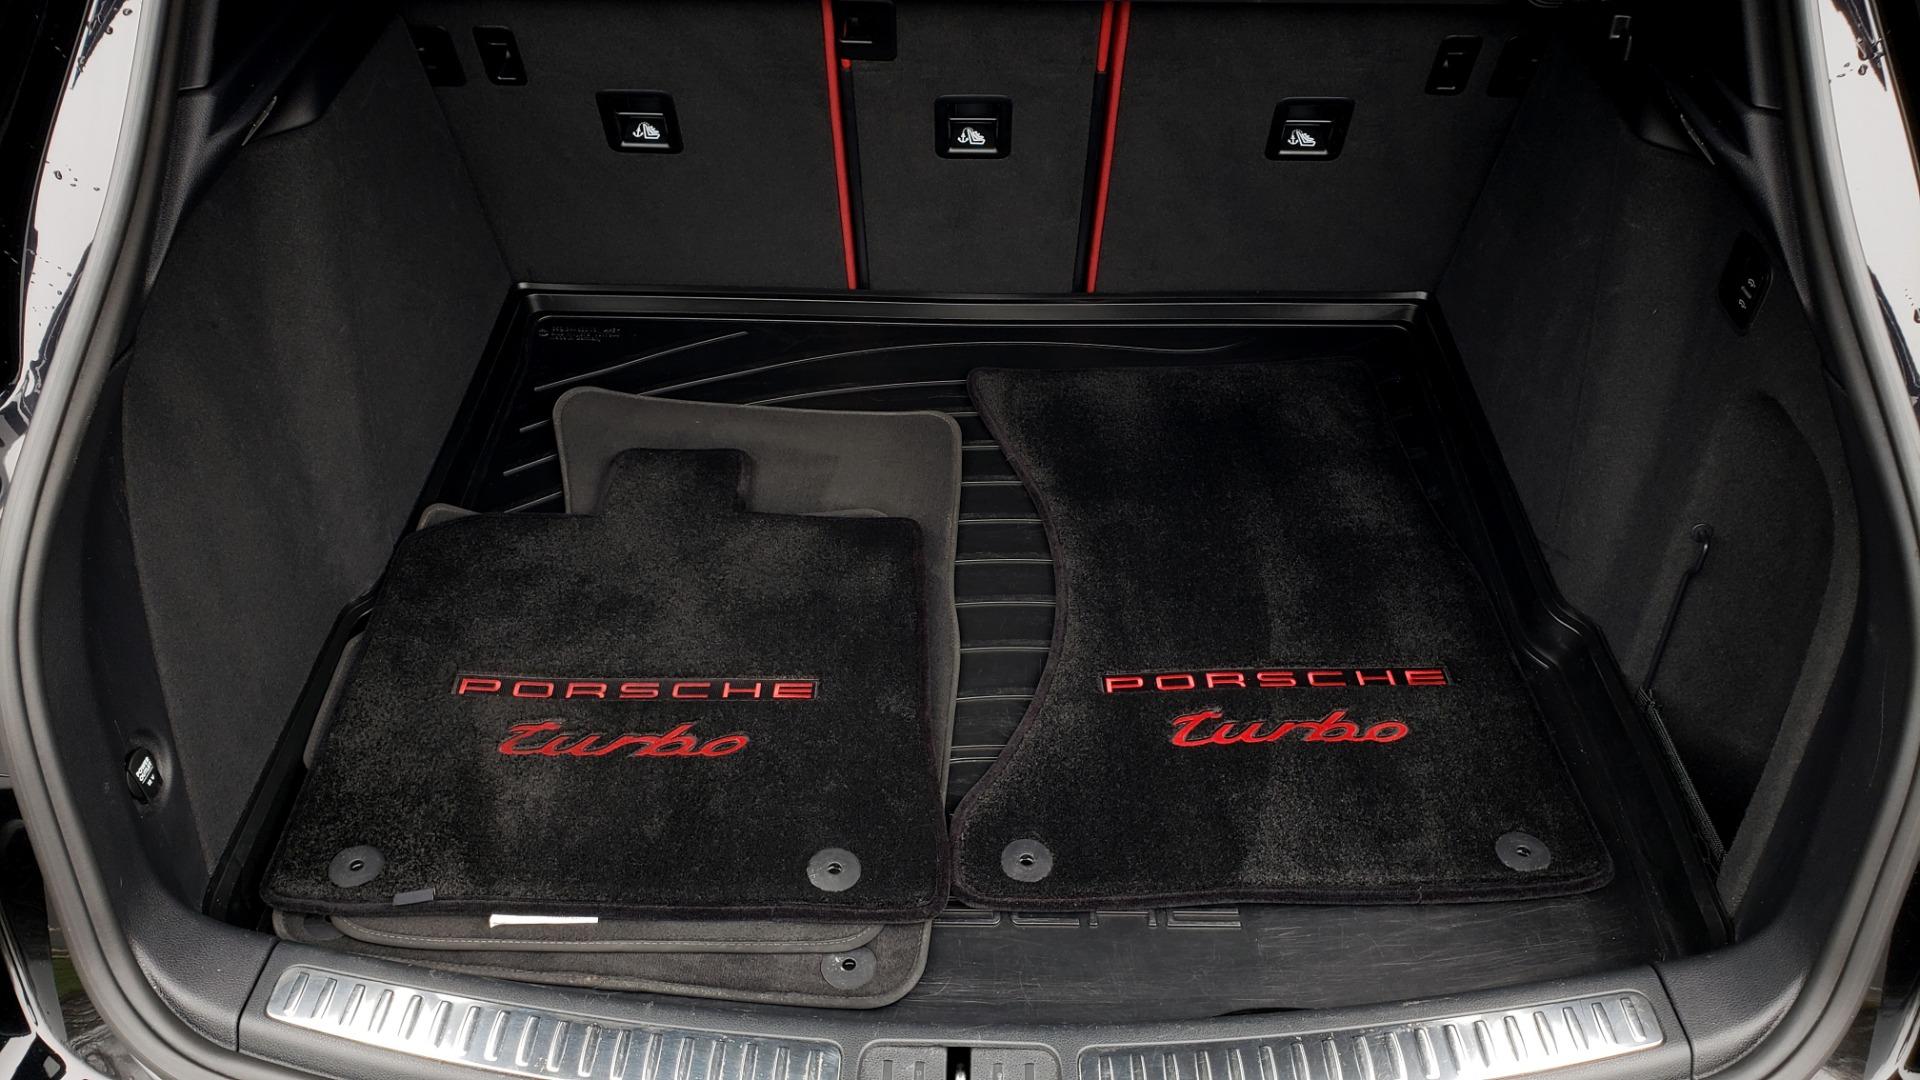 Used 2016 Porsche MACAN TURBO / PREM / NAV / PARK ASST / BOSE / PDK / CHRONO PKG for sale Sold at Formula Imports in Charlotte NC 28227 14